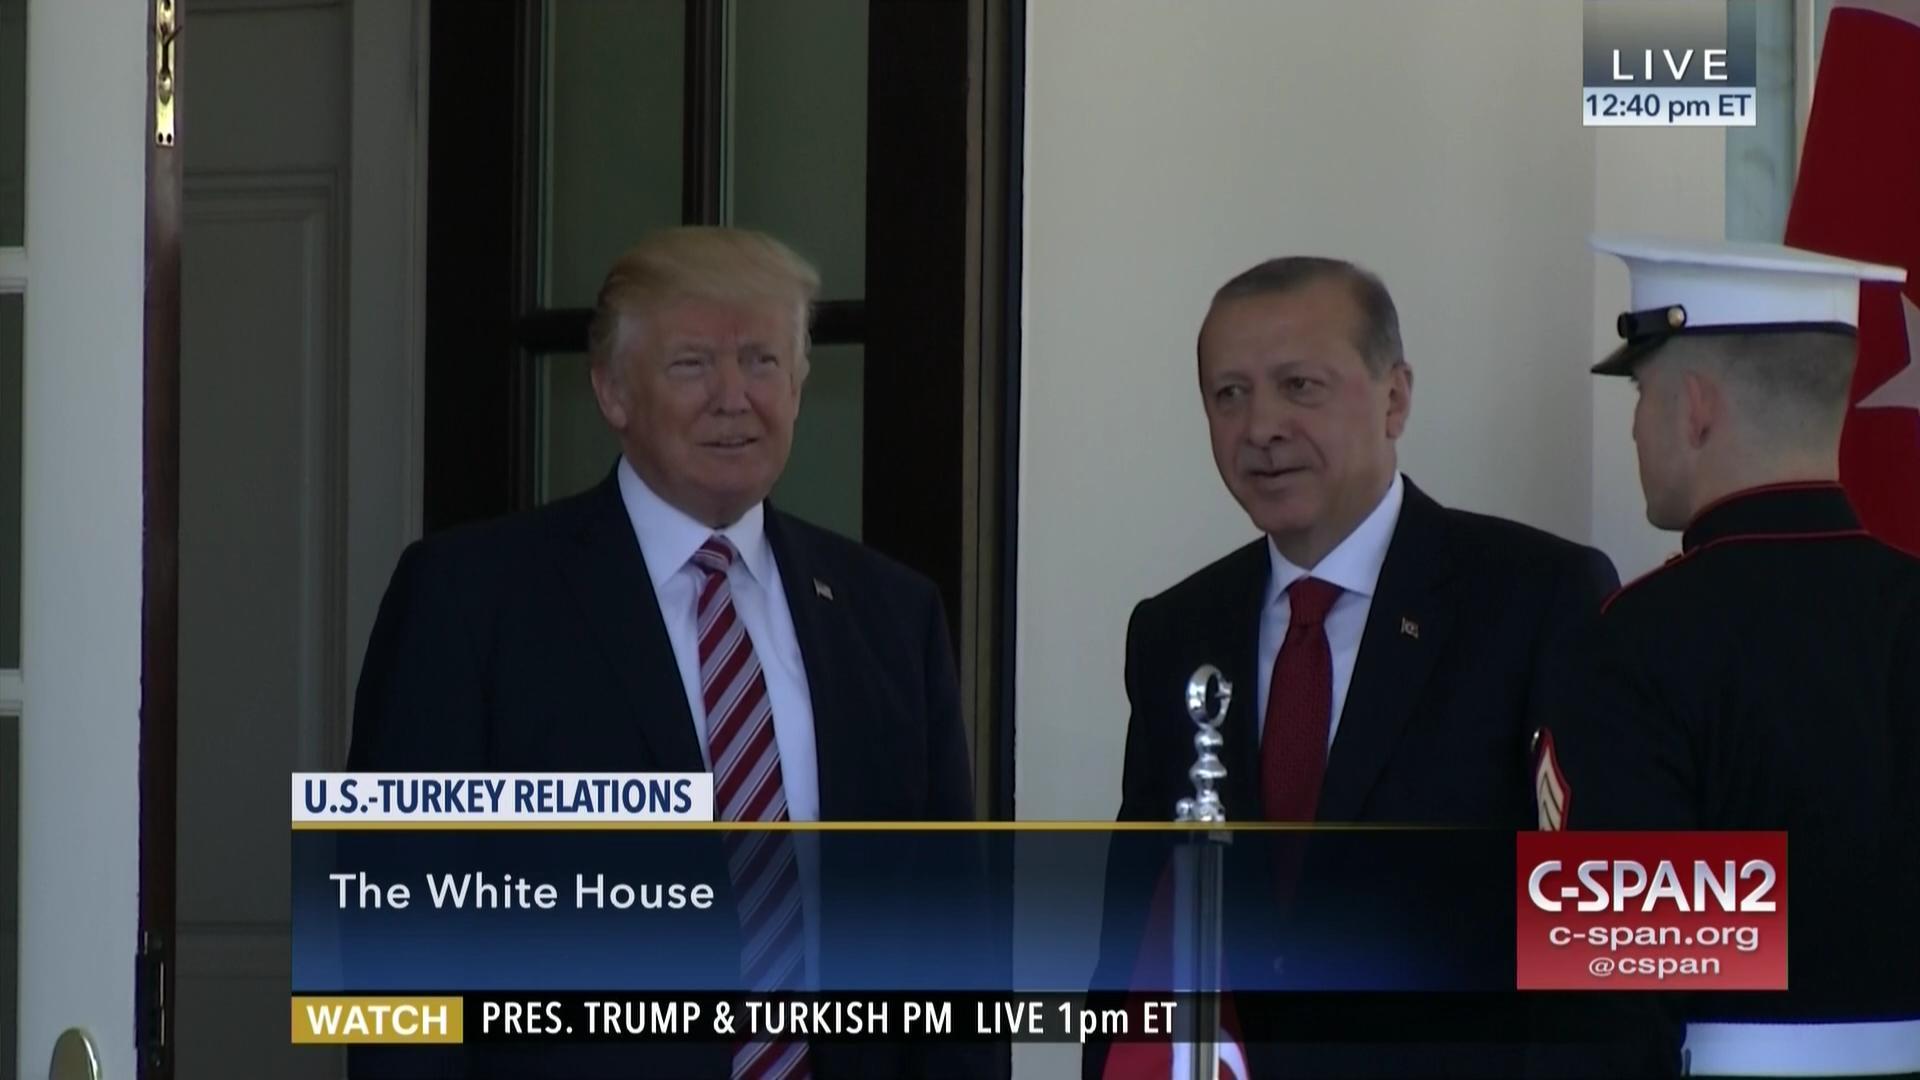 Turkish President Erdogan Arrival at the White House | C-SPAN.org